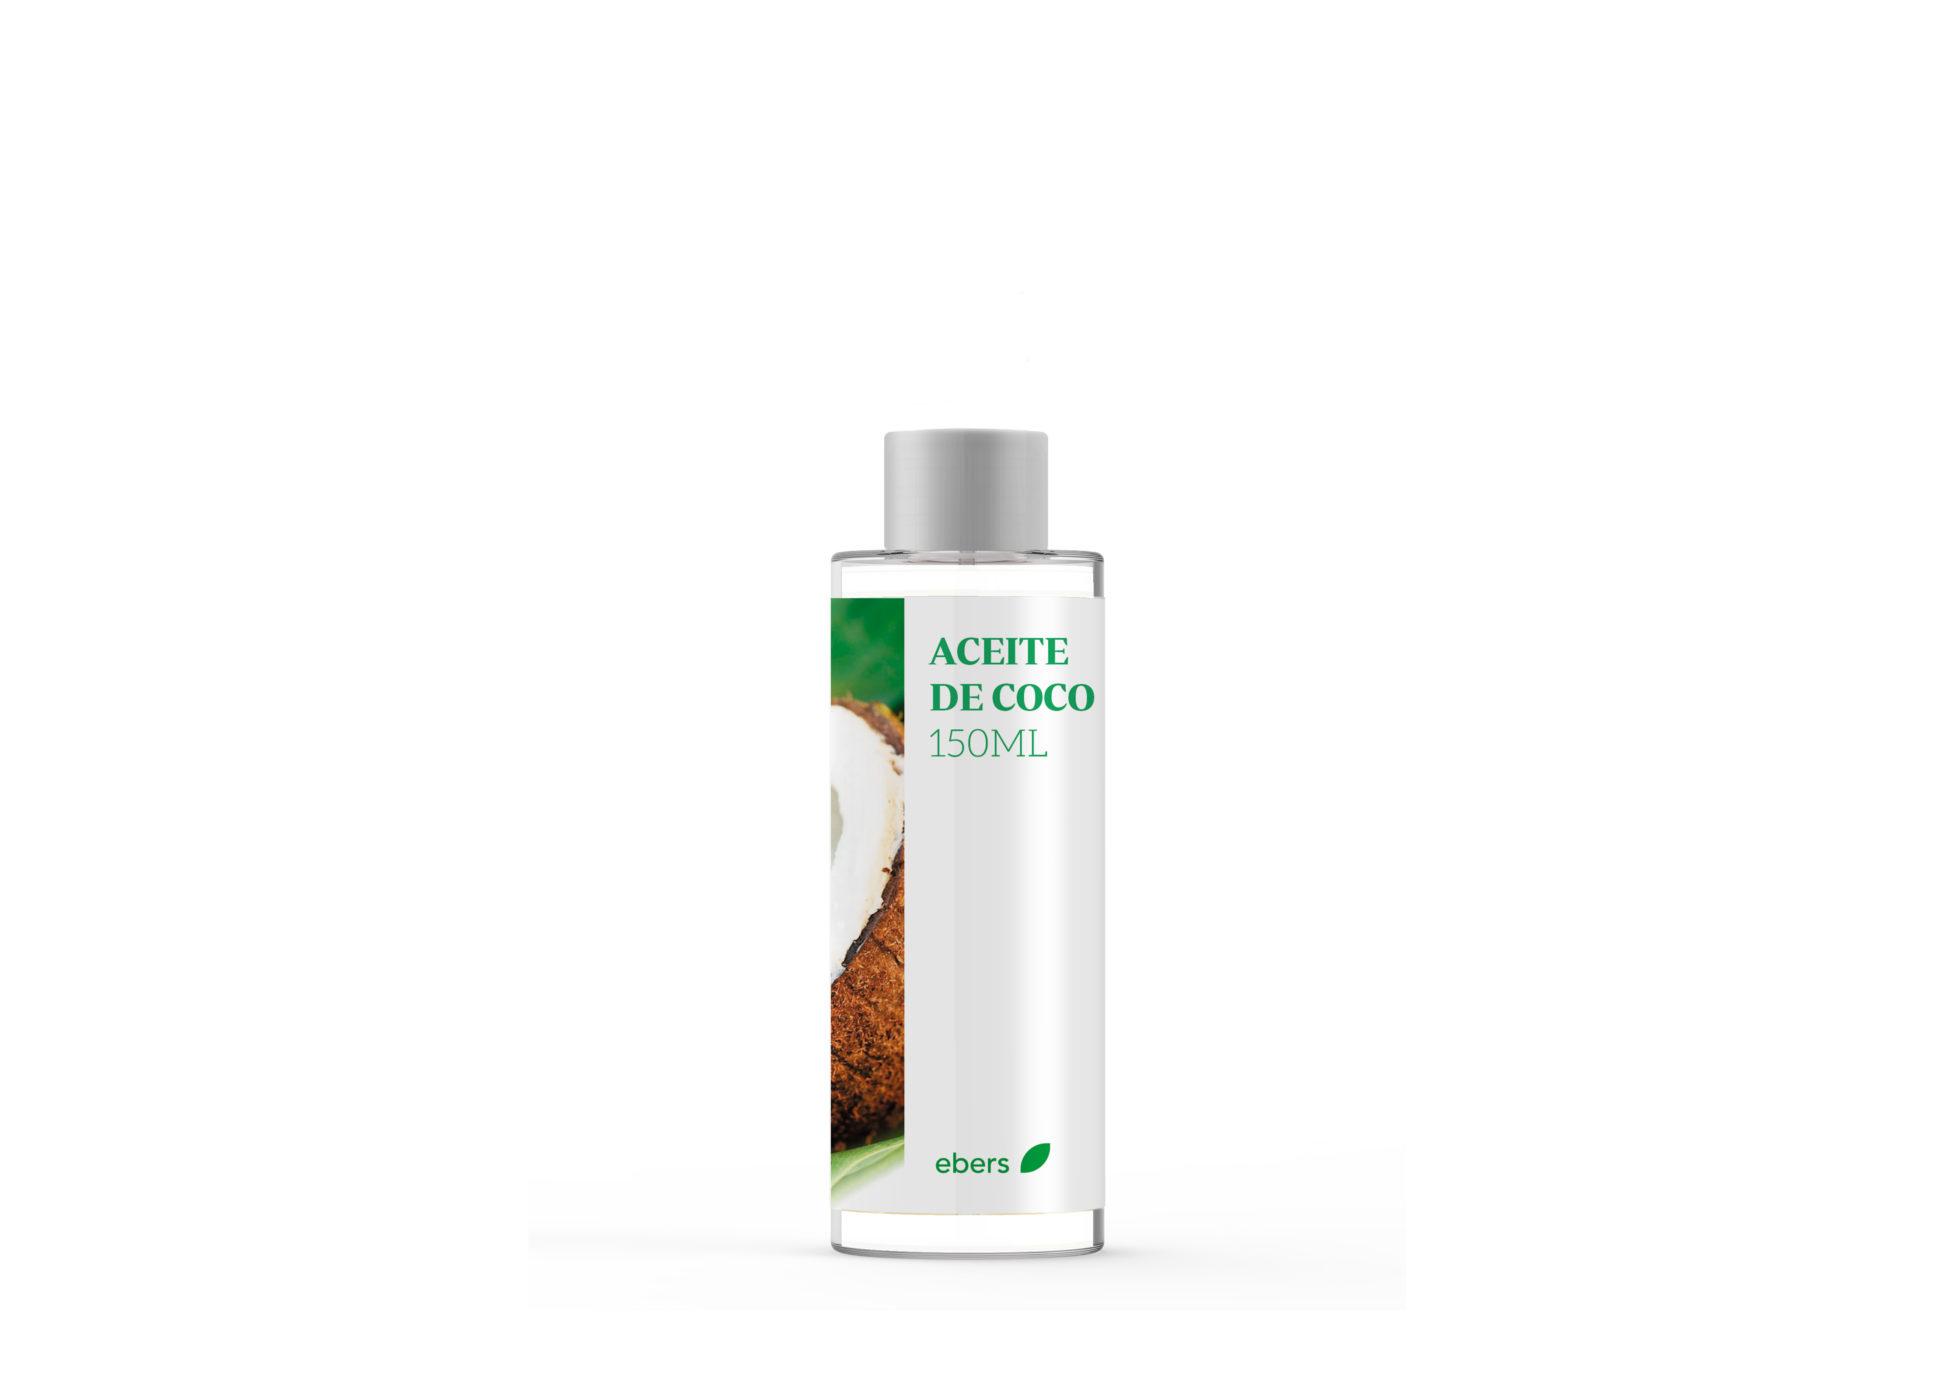 Aceite de coco – Ebers – 150 ml